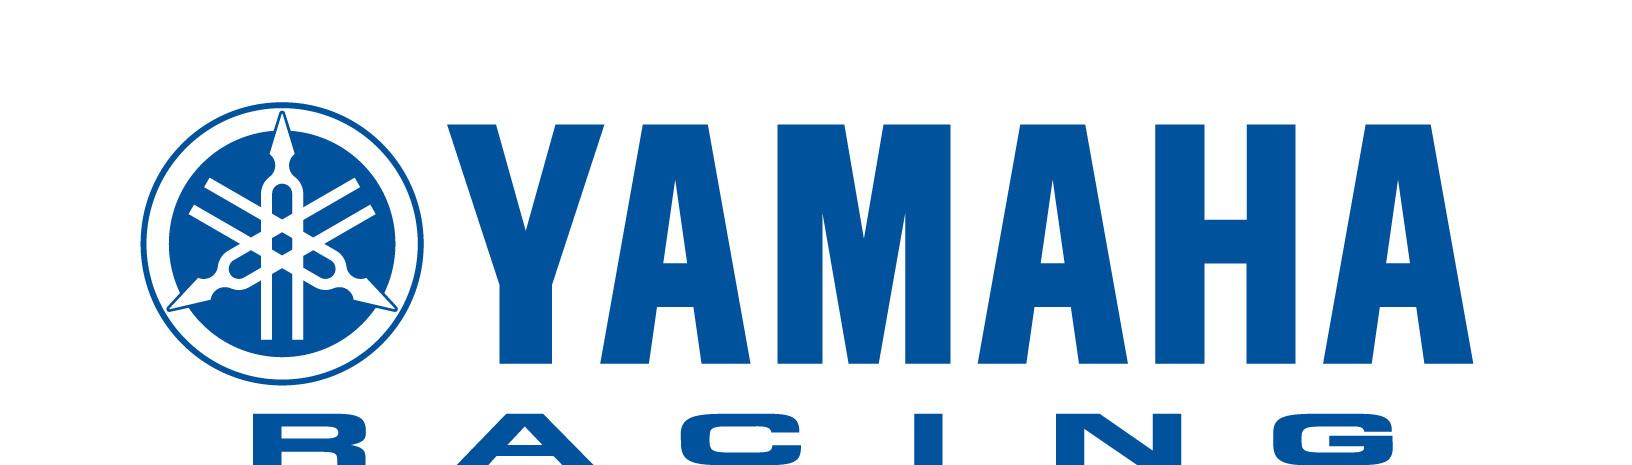 Yamaha_RACING_Logo_-_blue.jpg